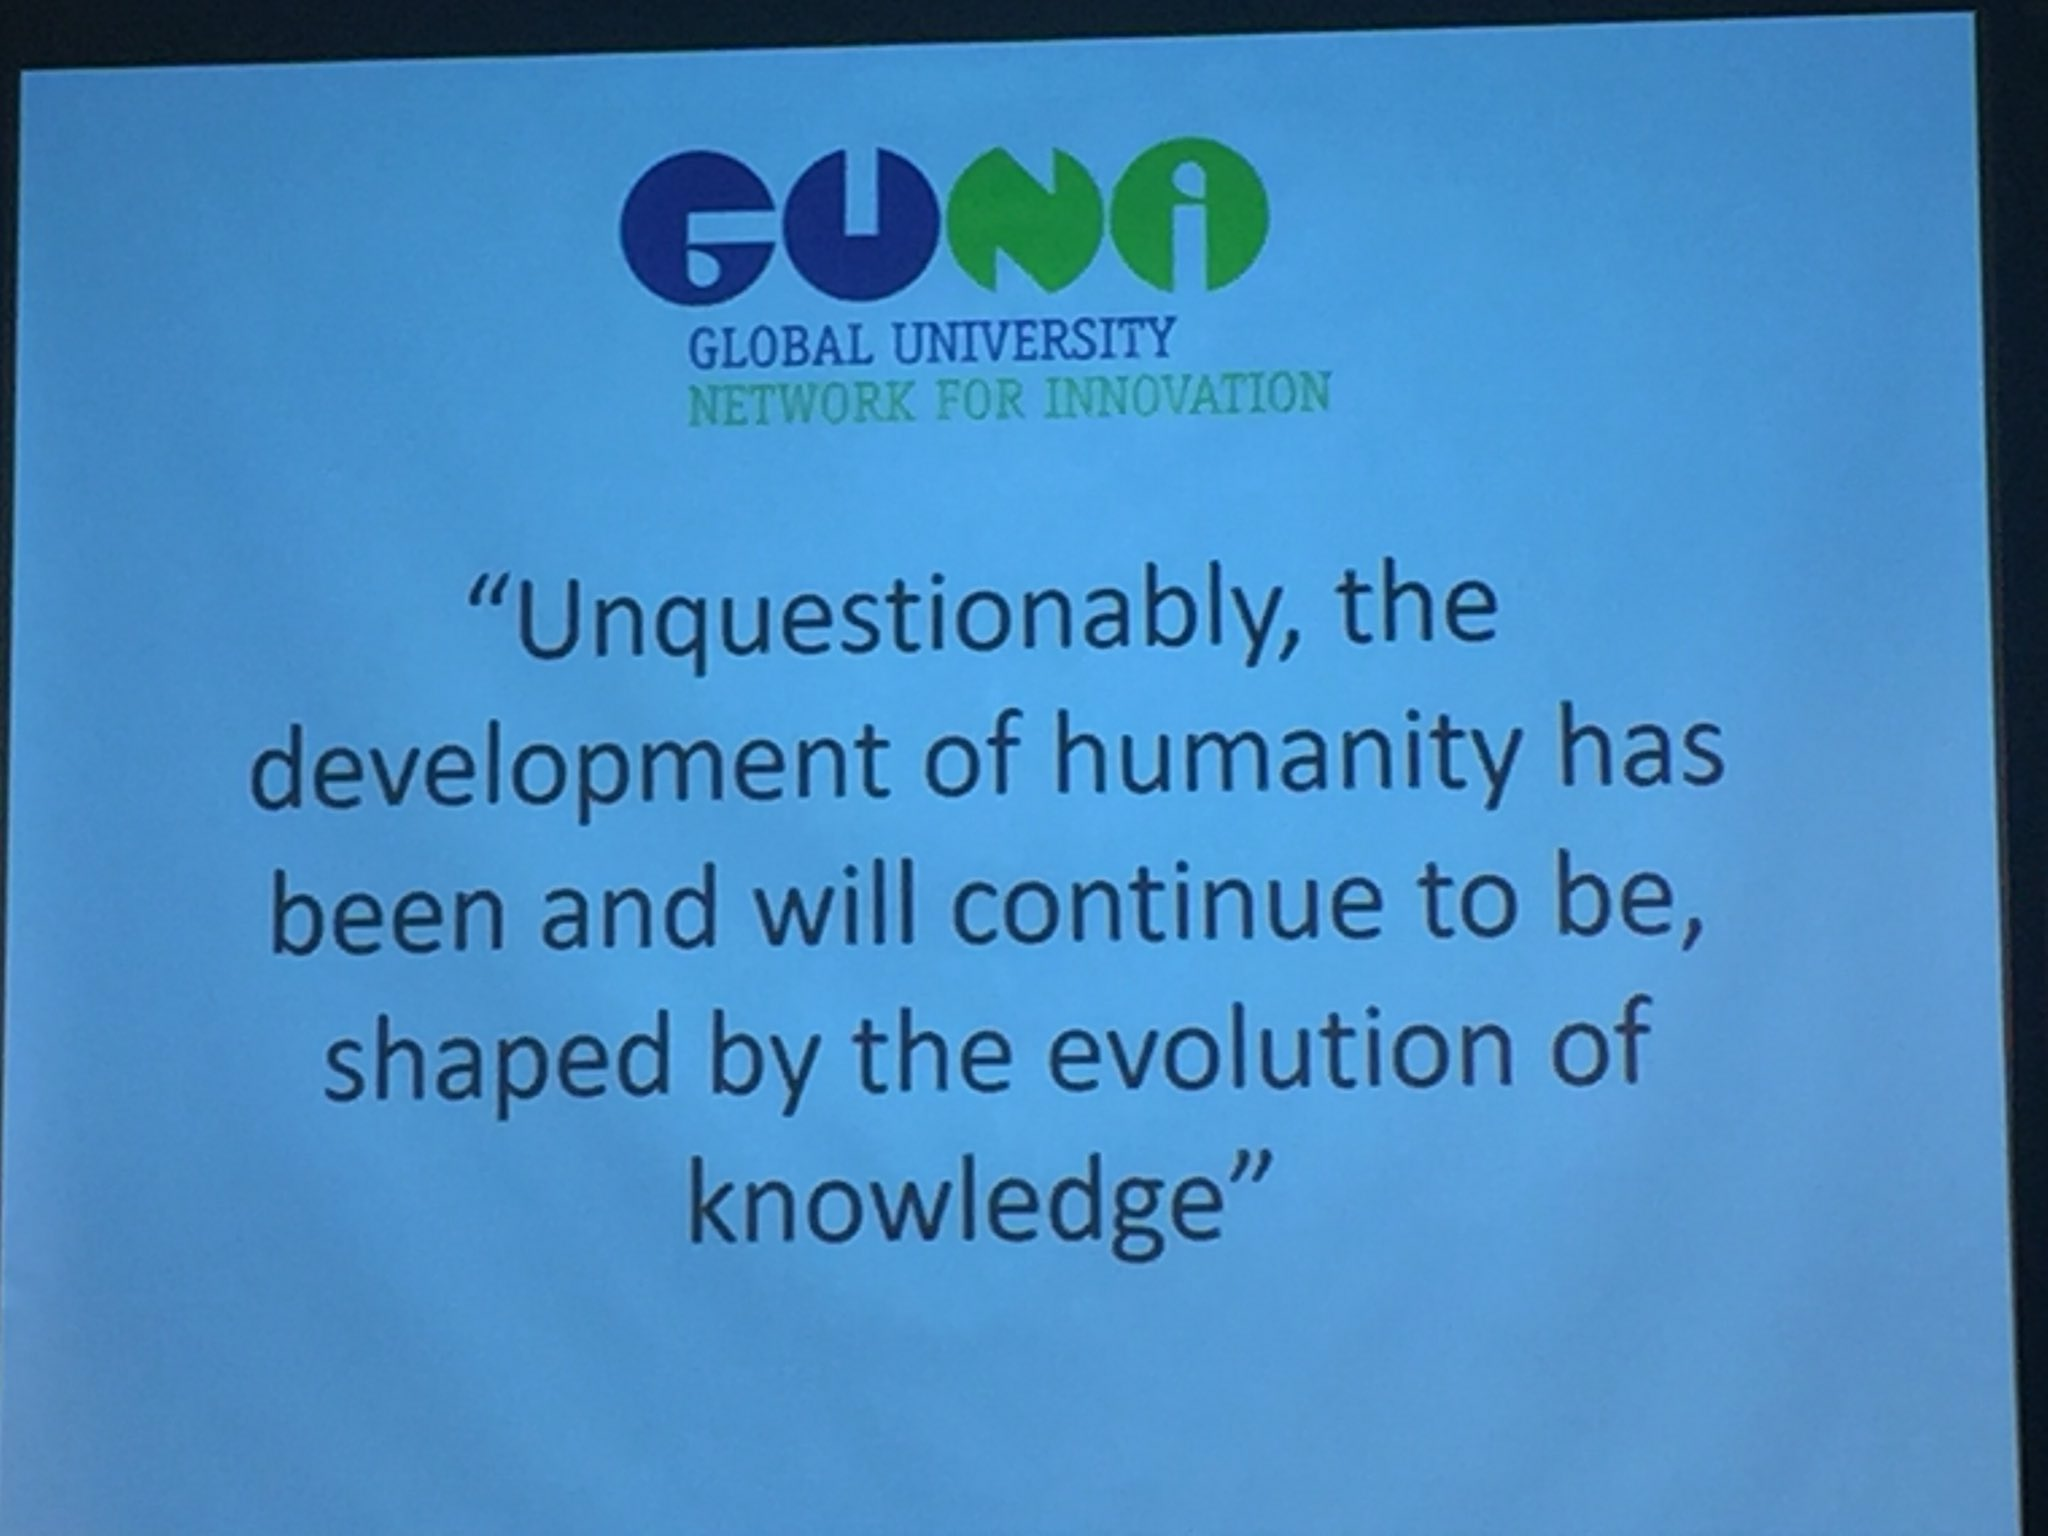 6th HEIW Report: Towards Socially Responsible Universities  @buddhall #GUNIReport https://t.co/a8cCNKEBiq